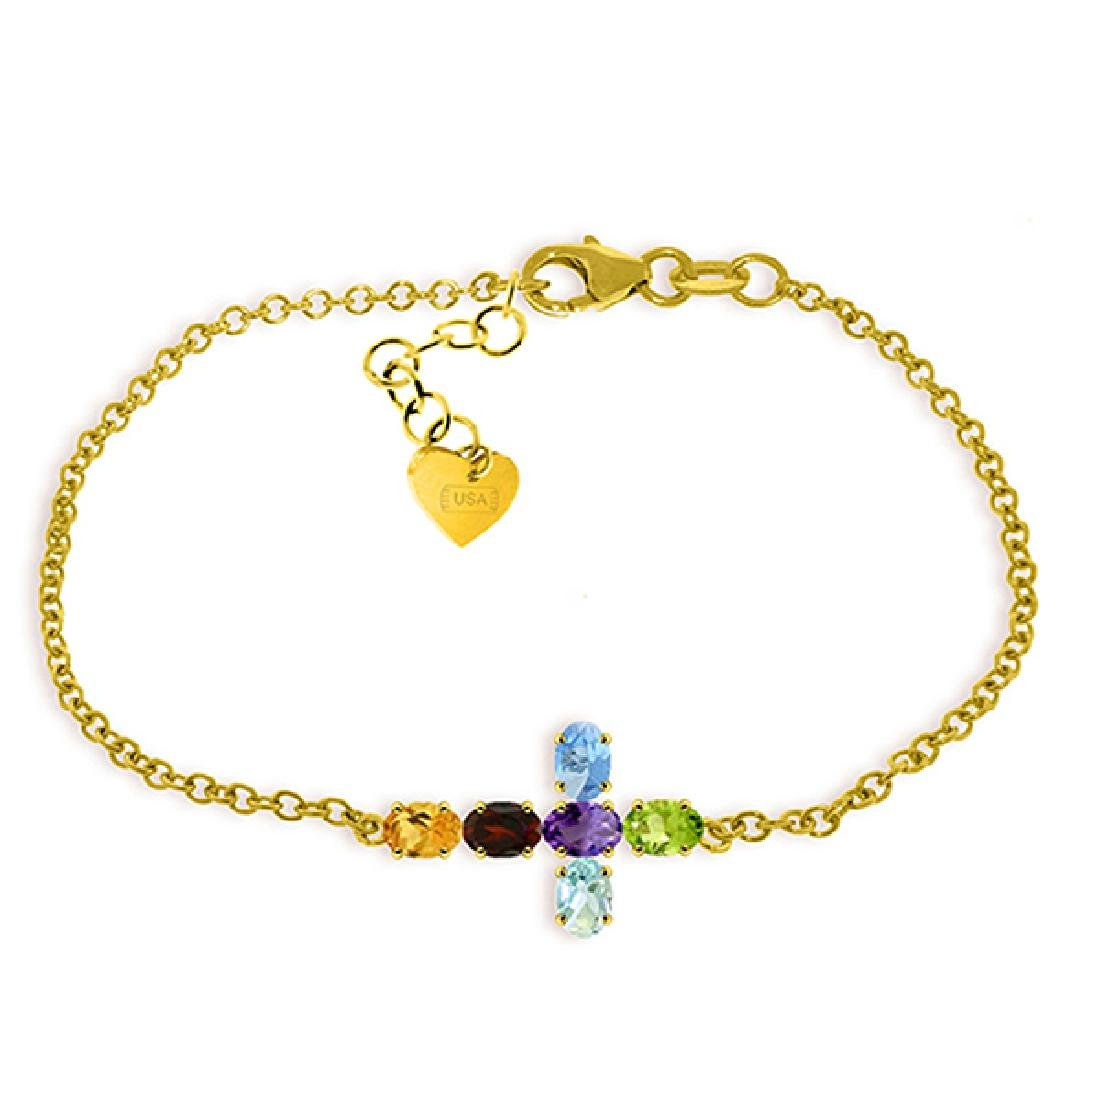 Genuine 1.68 ctw Multi-gemstones Bracelet Jewelry 14KT